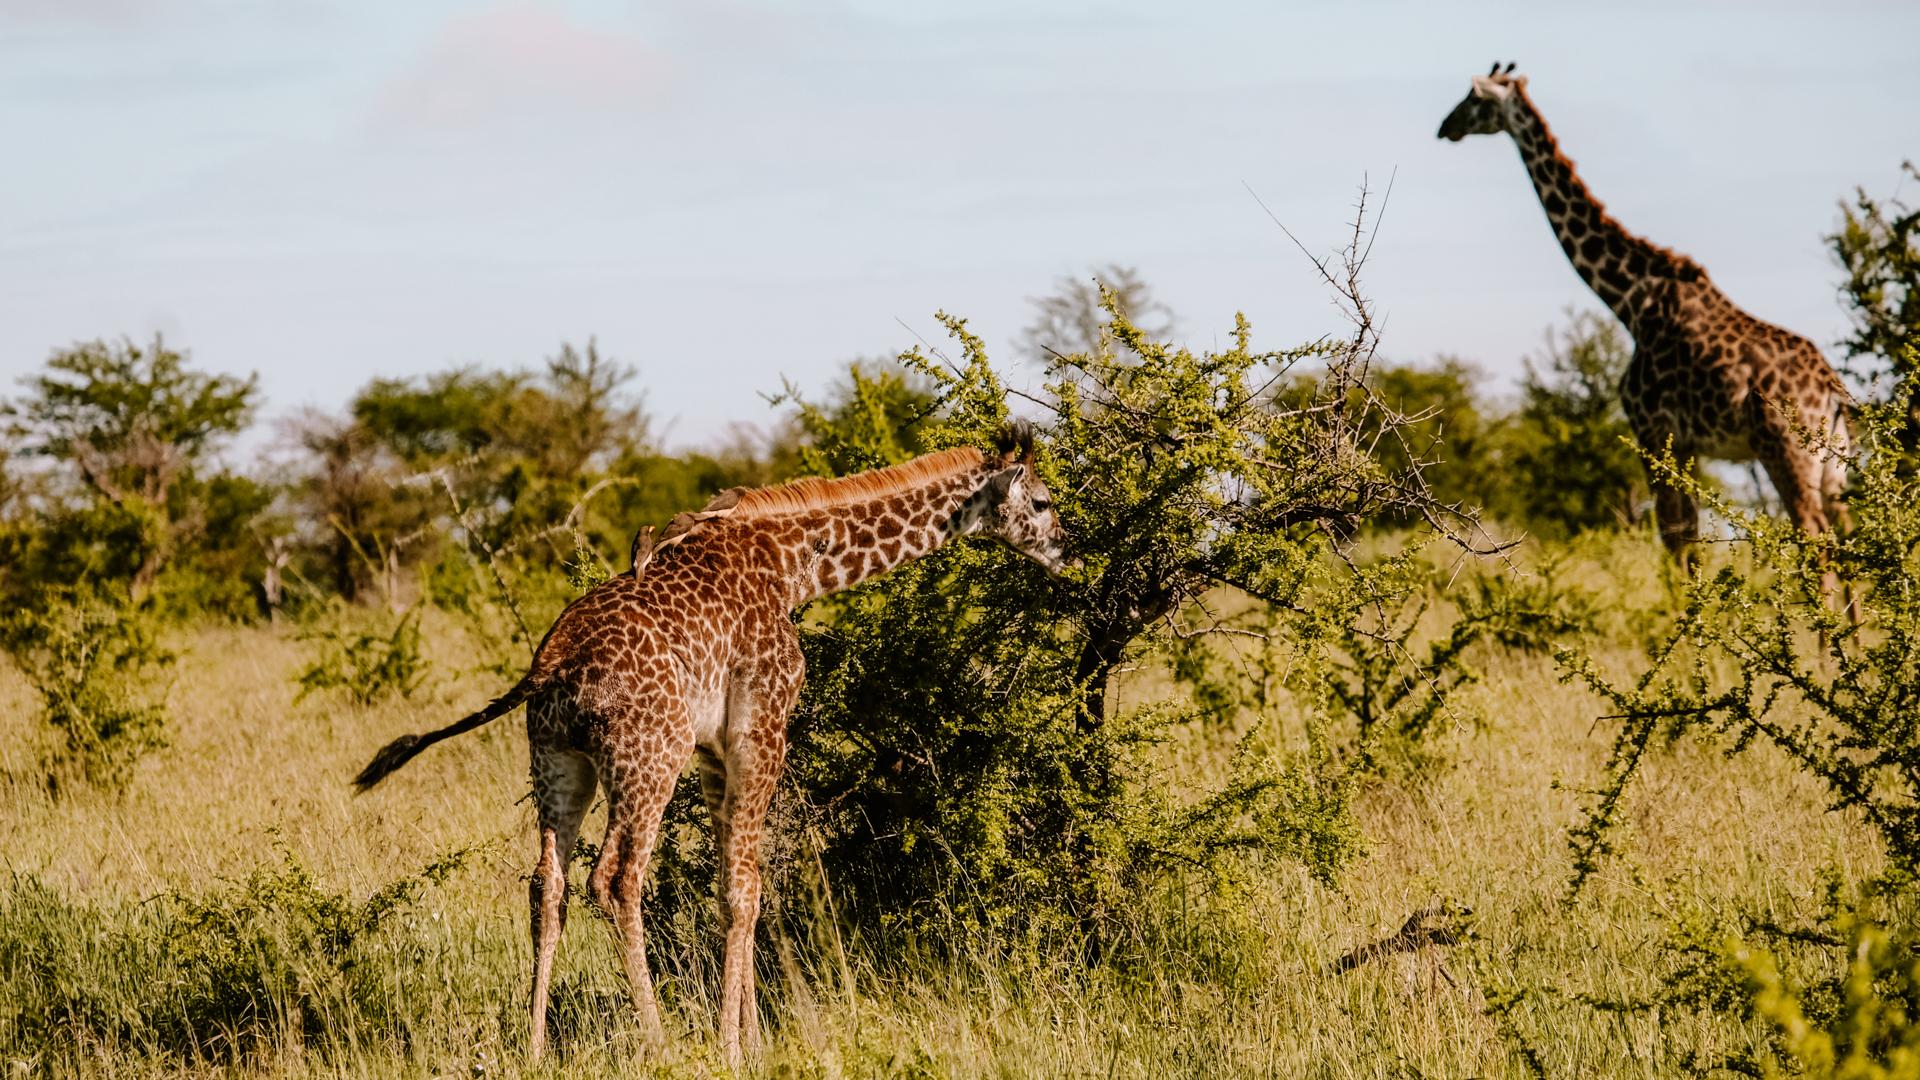 A young Masai giraffe eating off an acacia bush in the Serengeti National Park, Tanzania